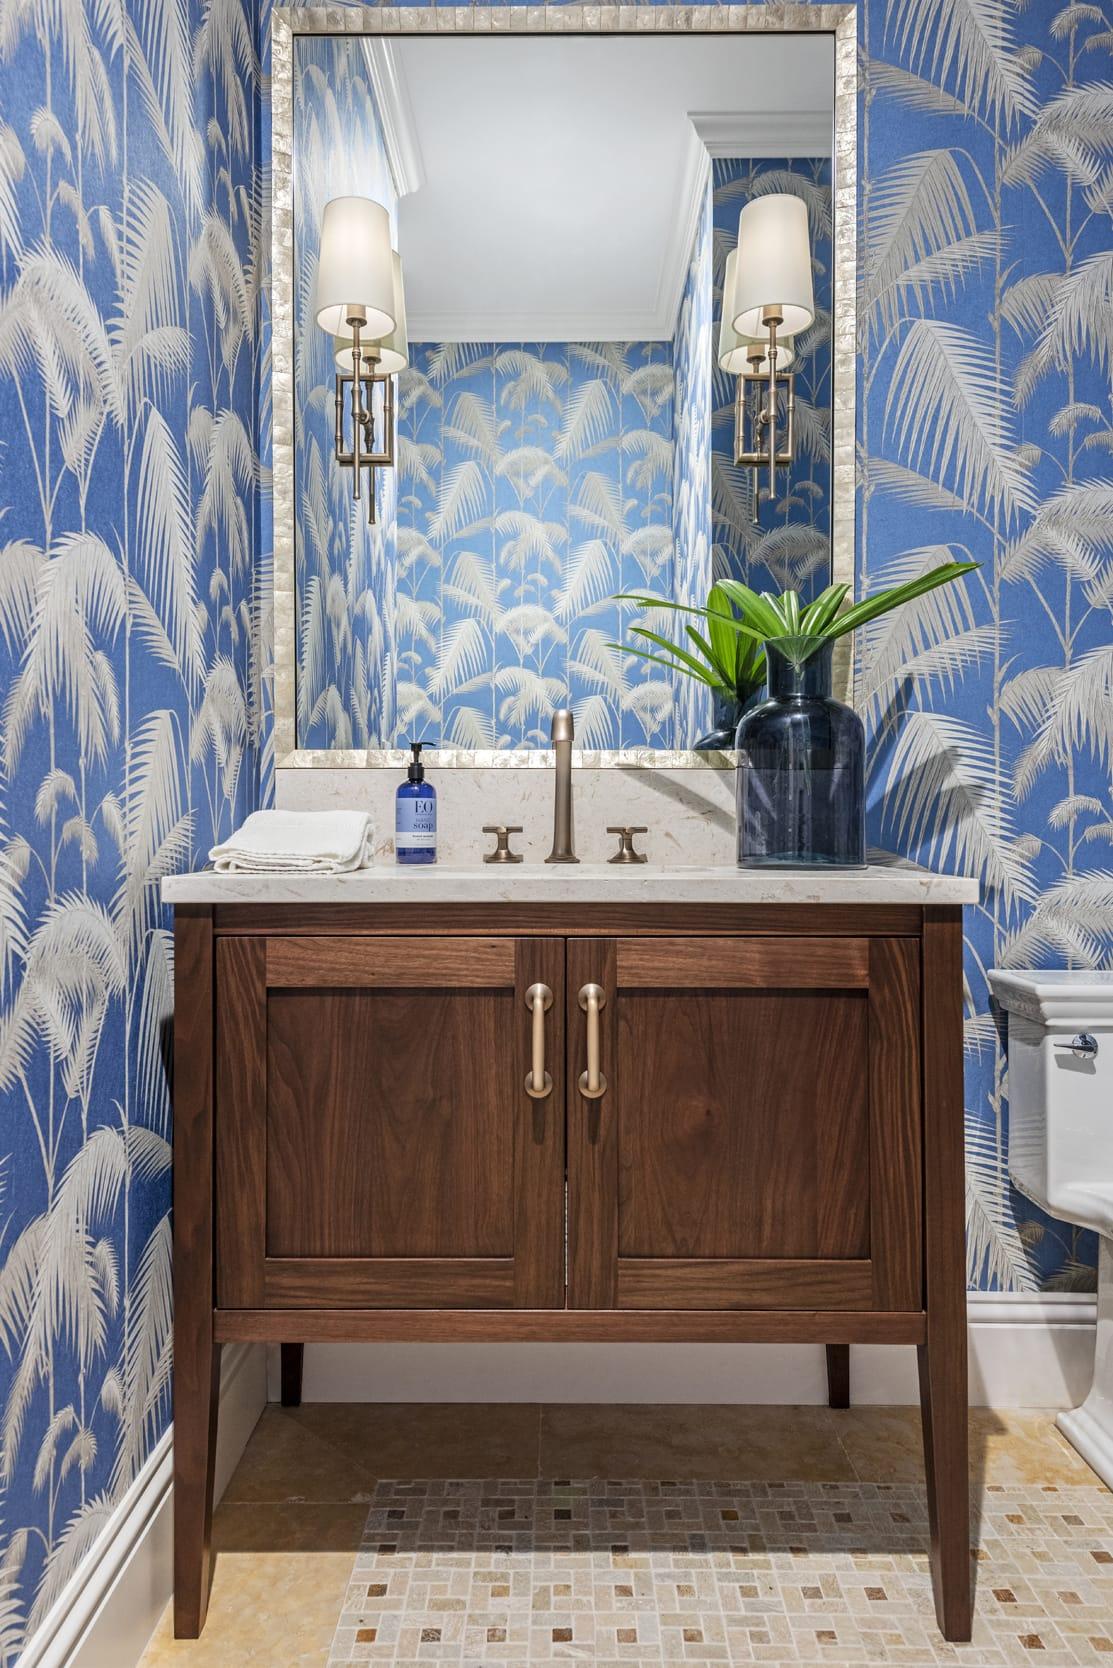 Jeffrey Fisher Home Dark Wood Cabinet Stone Sink Gold Fosset Blue Fern Wall Paper Mirror